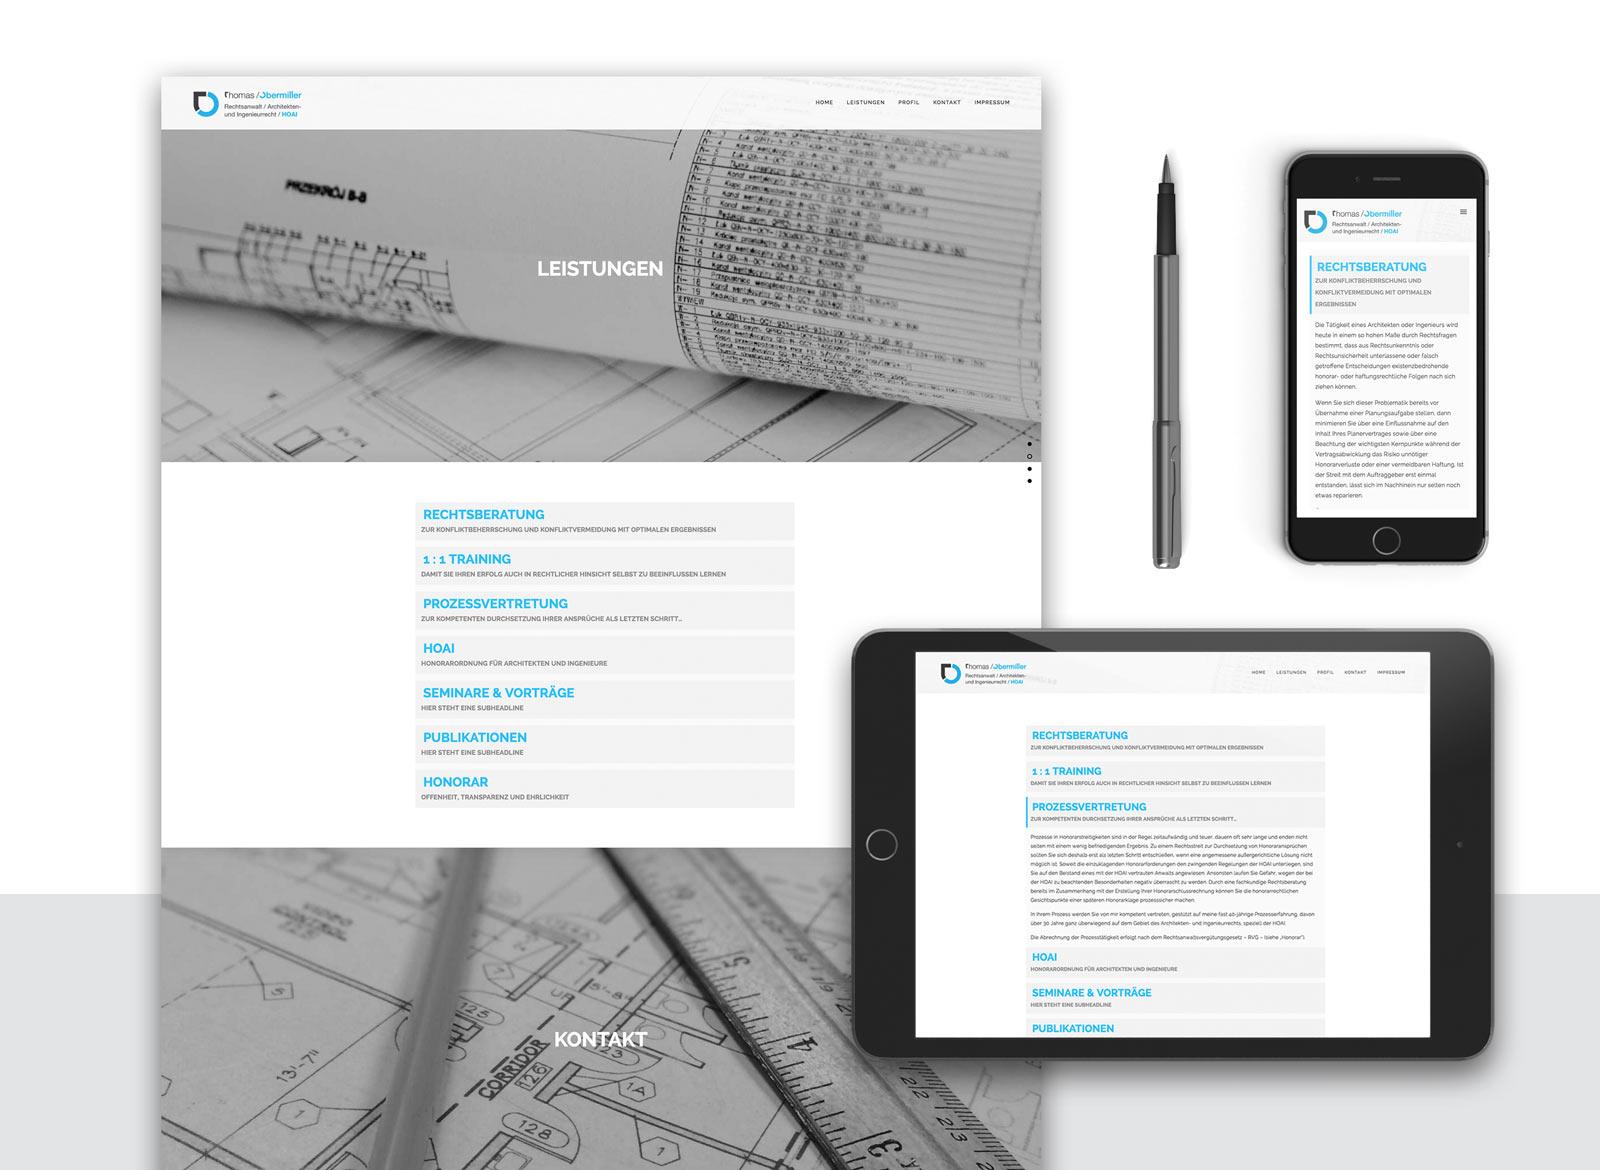 Obermiller_Responsive_Webdesign_7.jpg